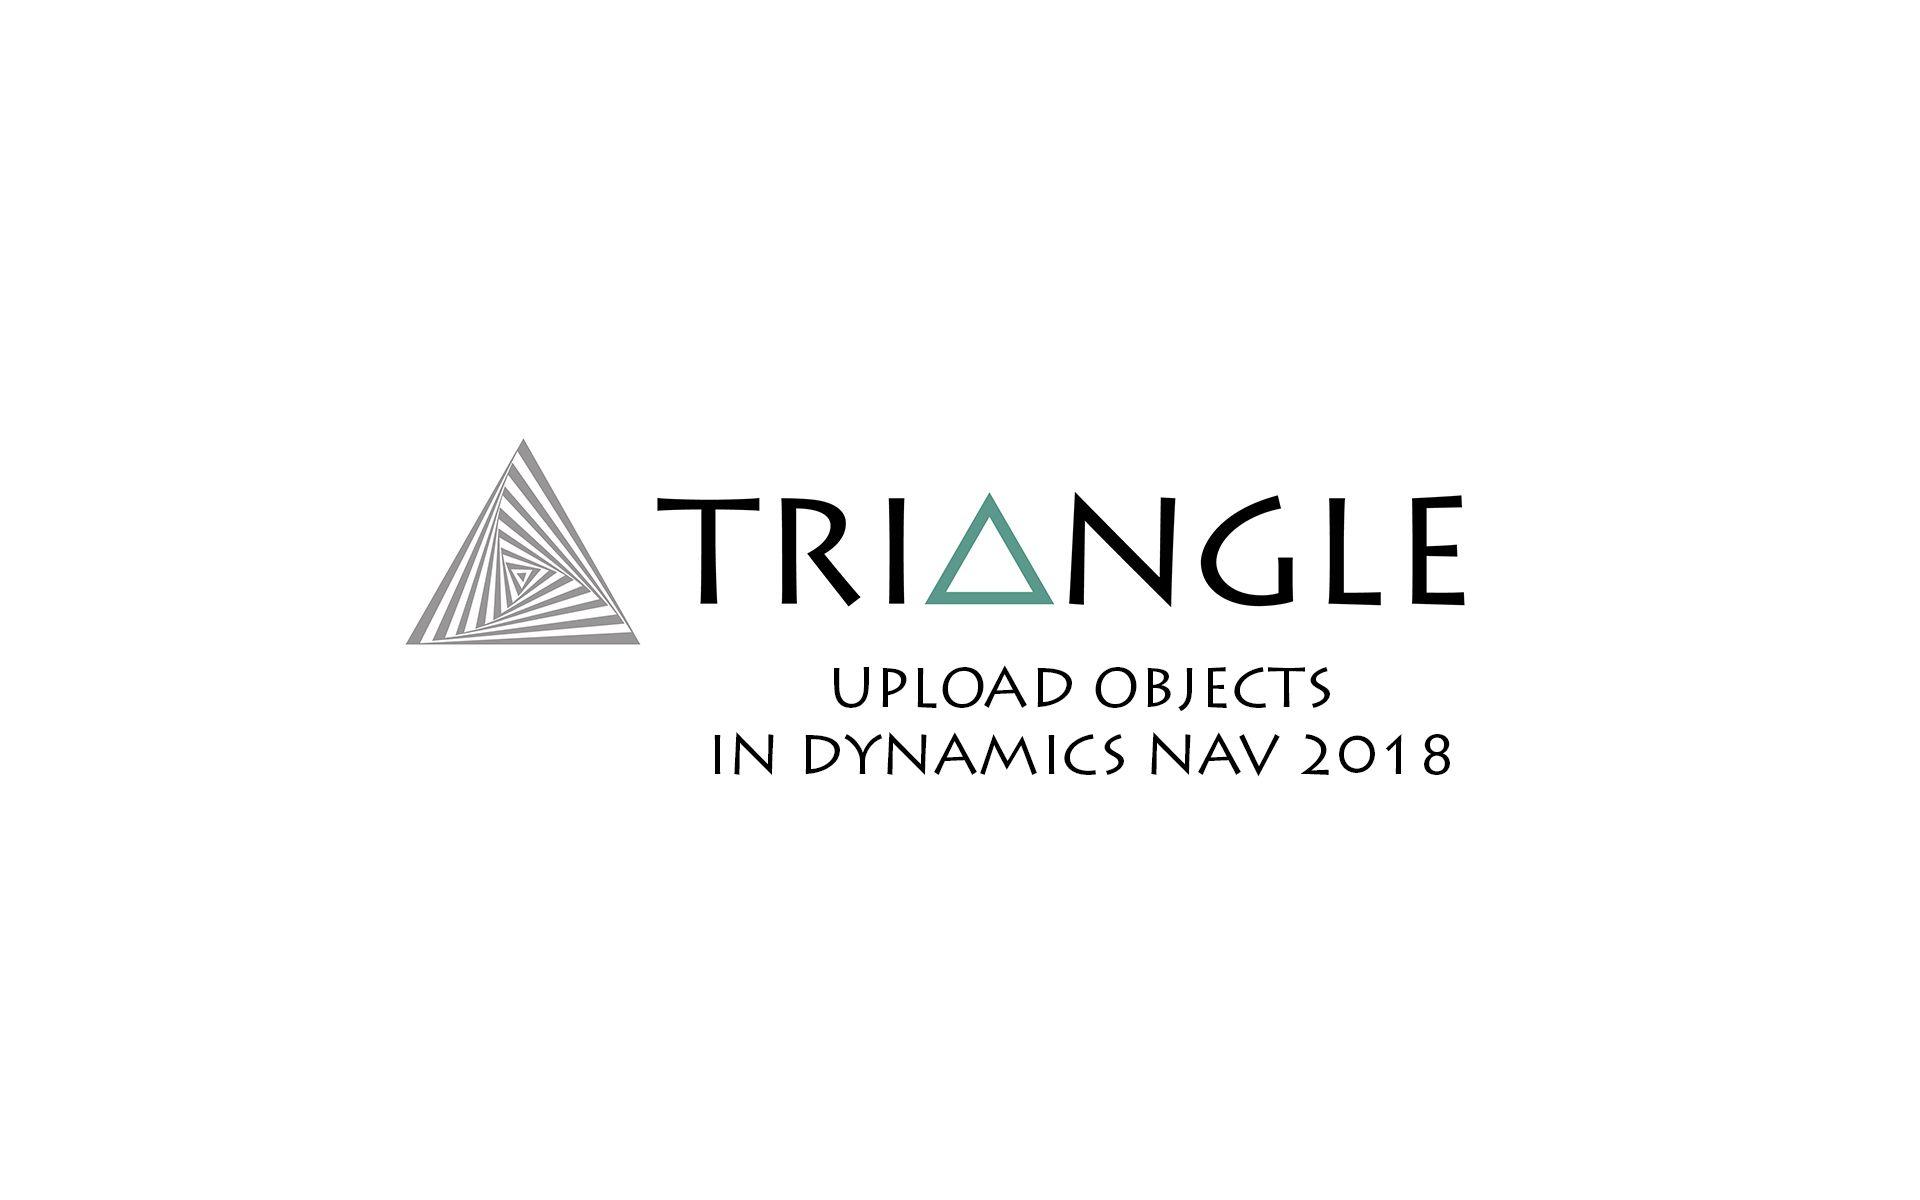 Upload Objects Dynamics NAV 2018